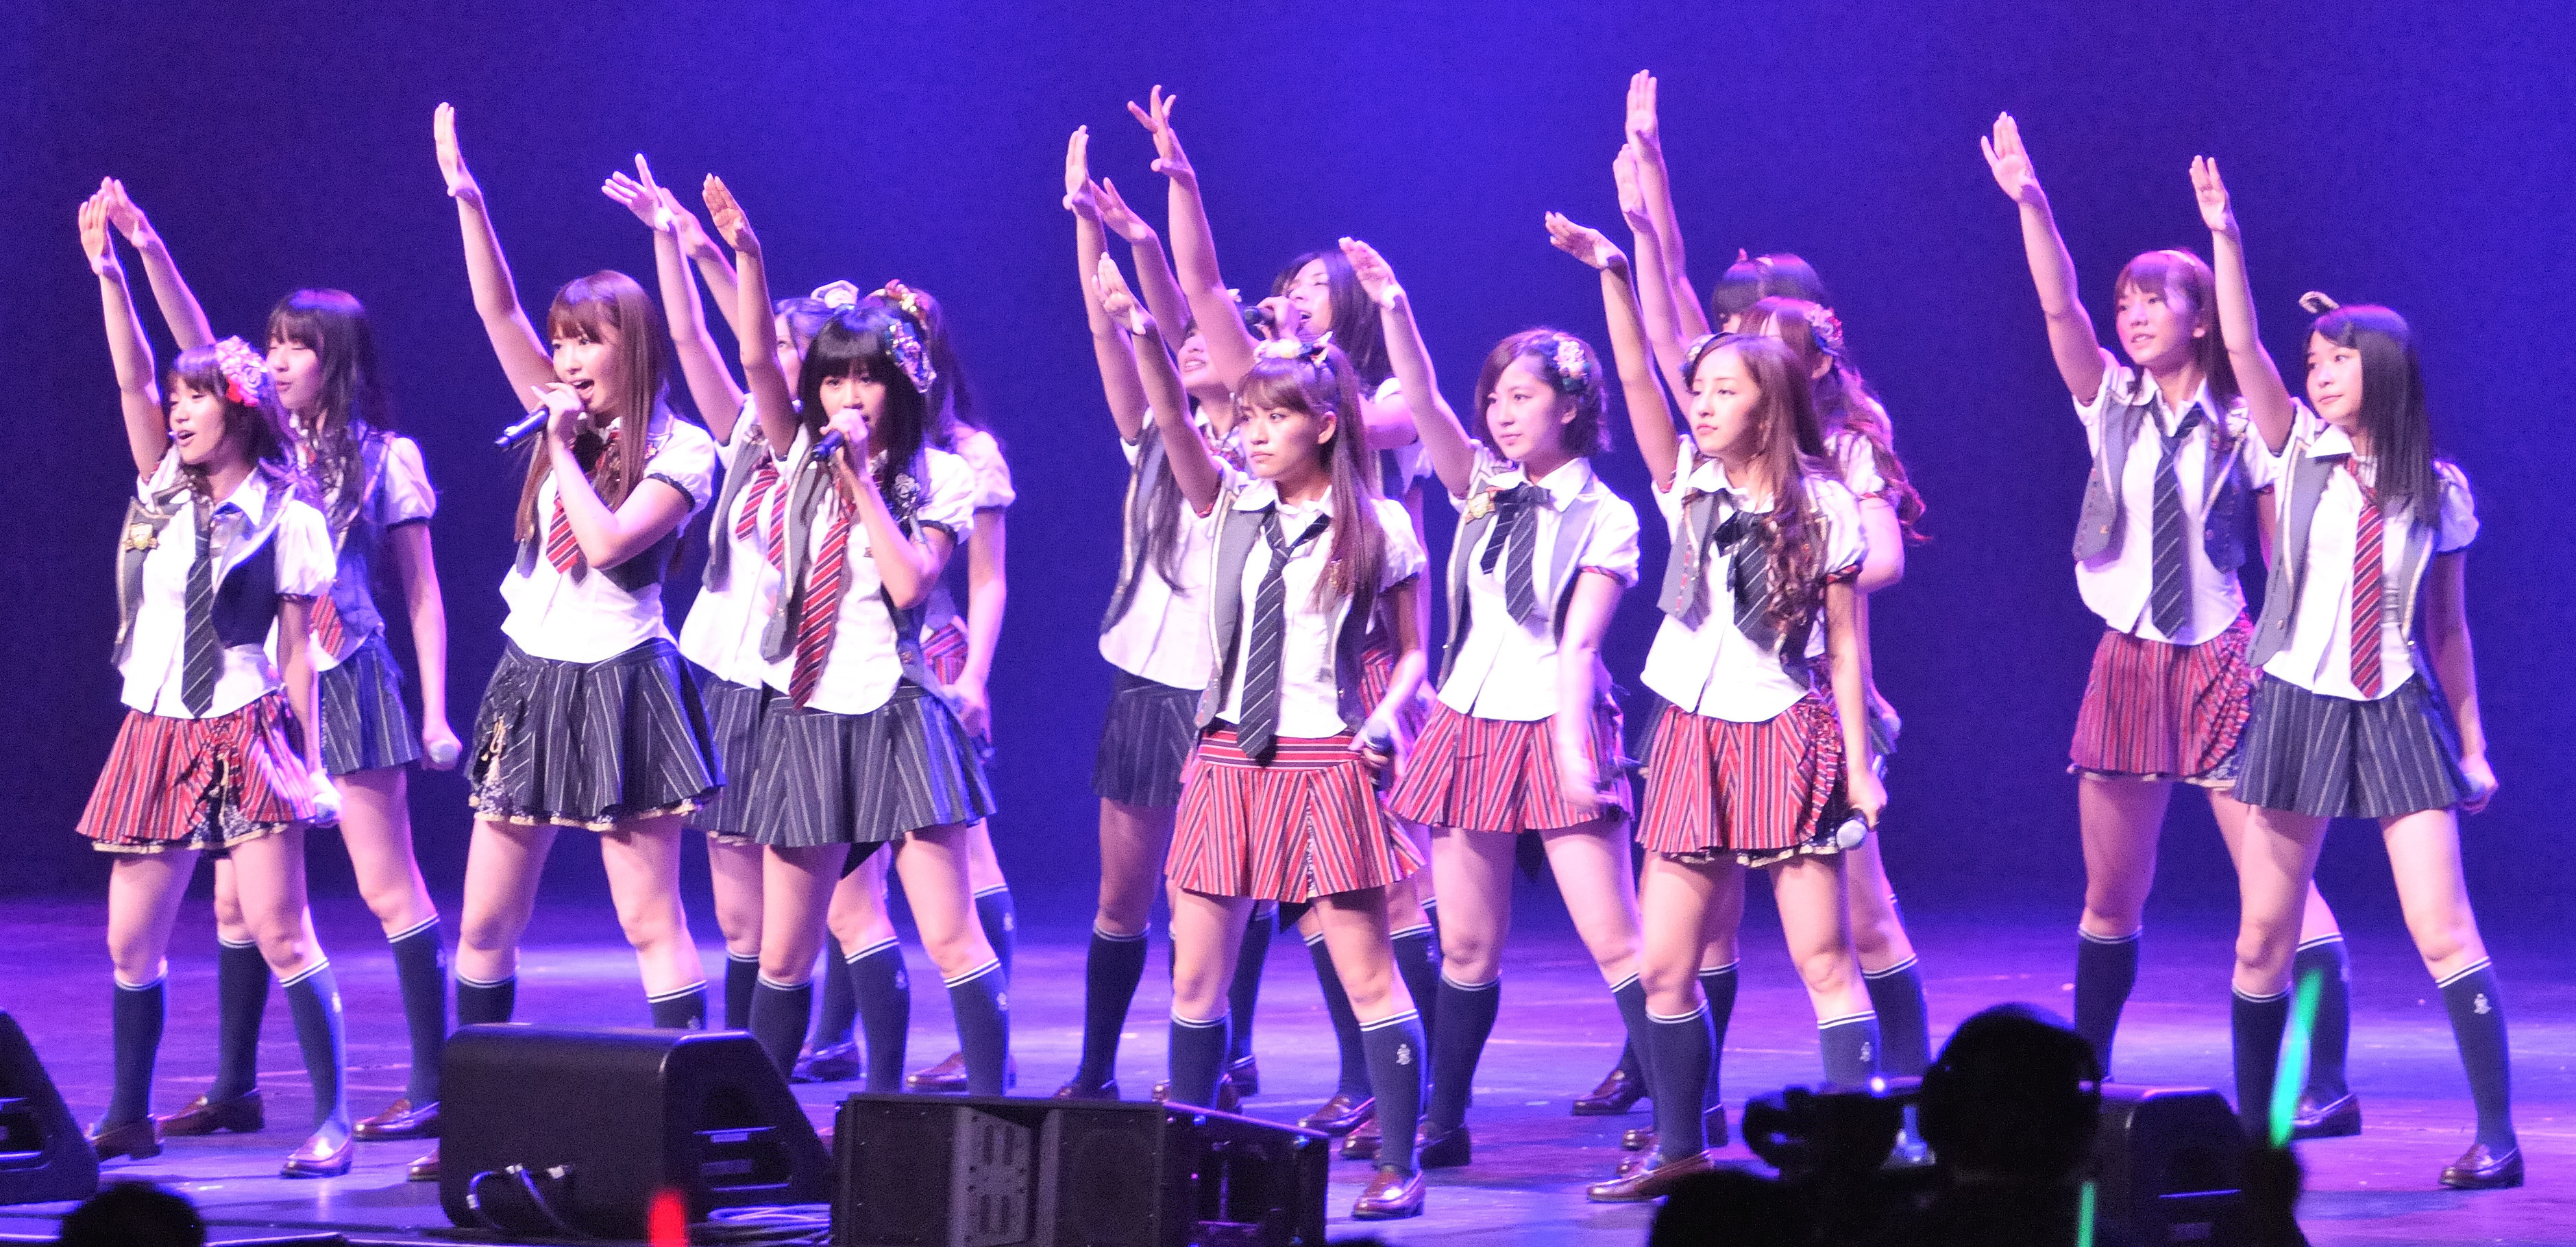 AKB48 - Wikipedia